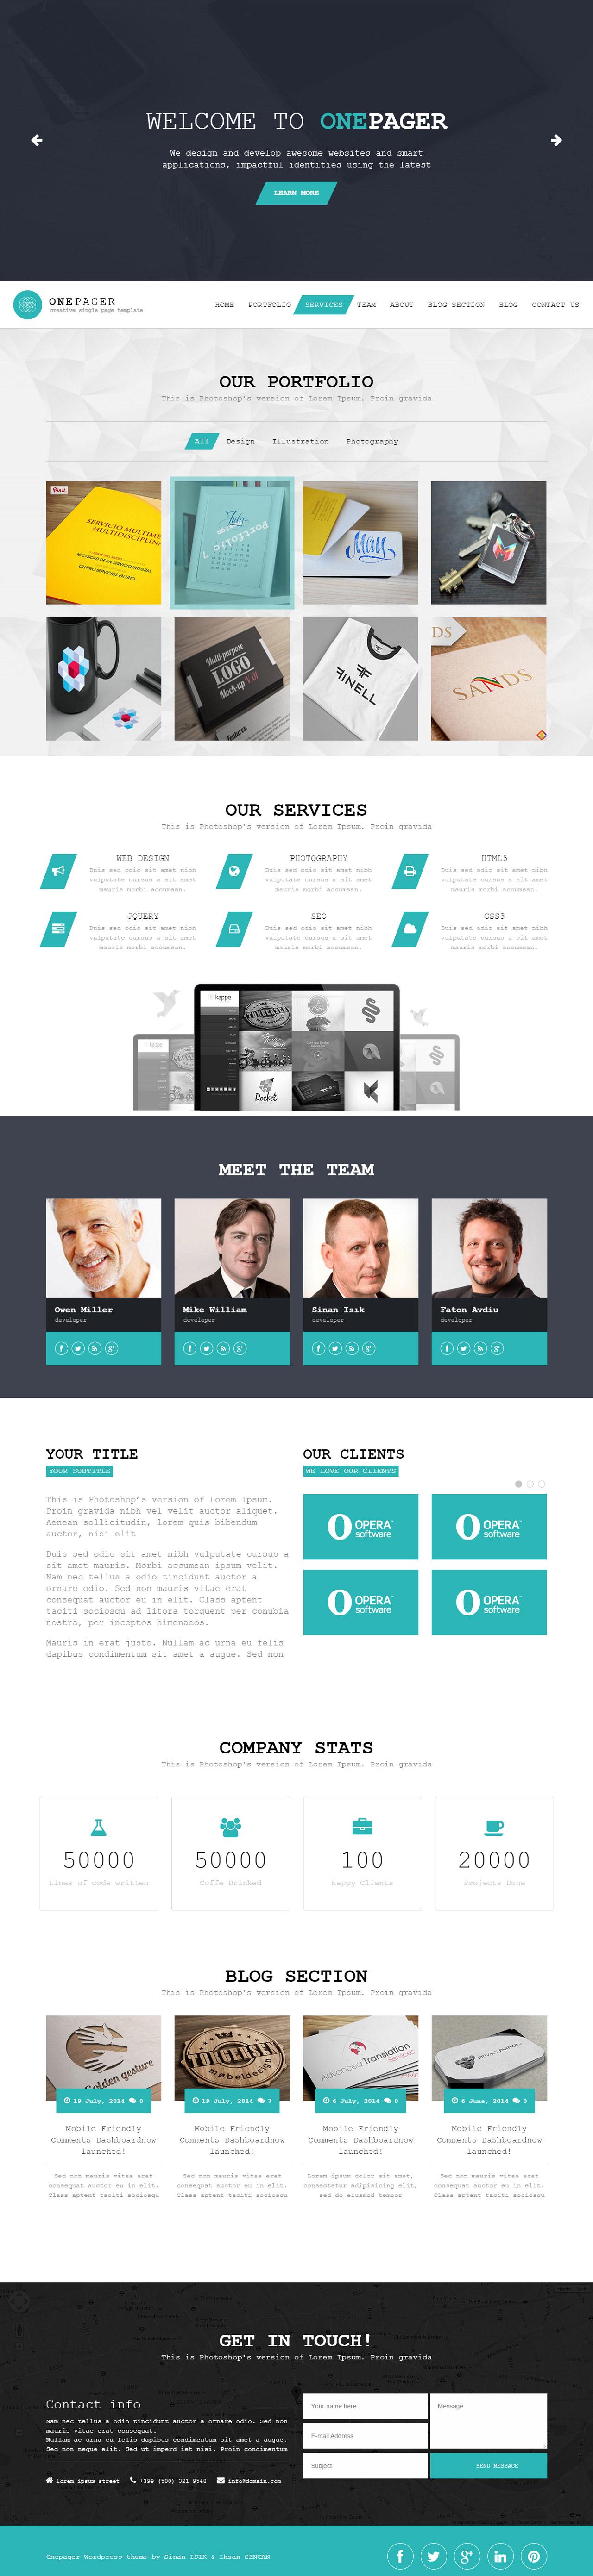 OnePager Website Screenshot